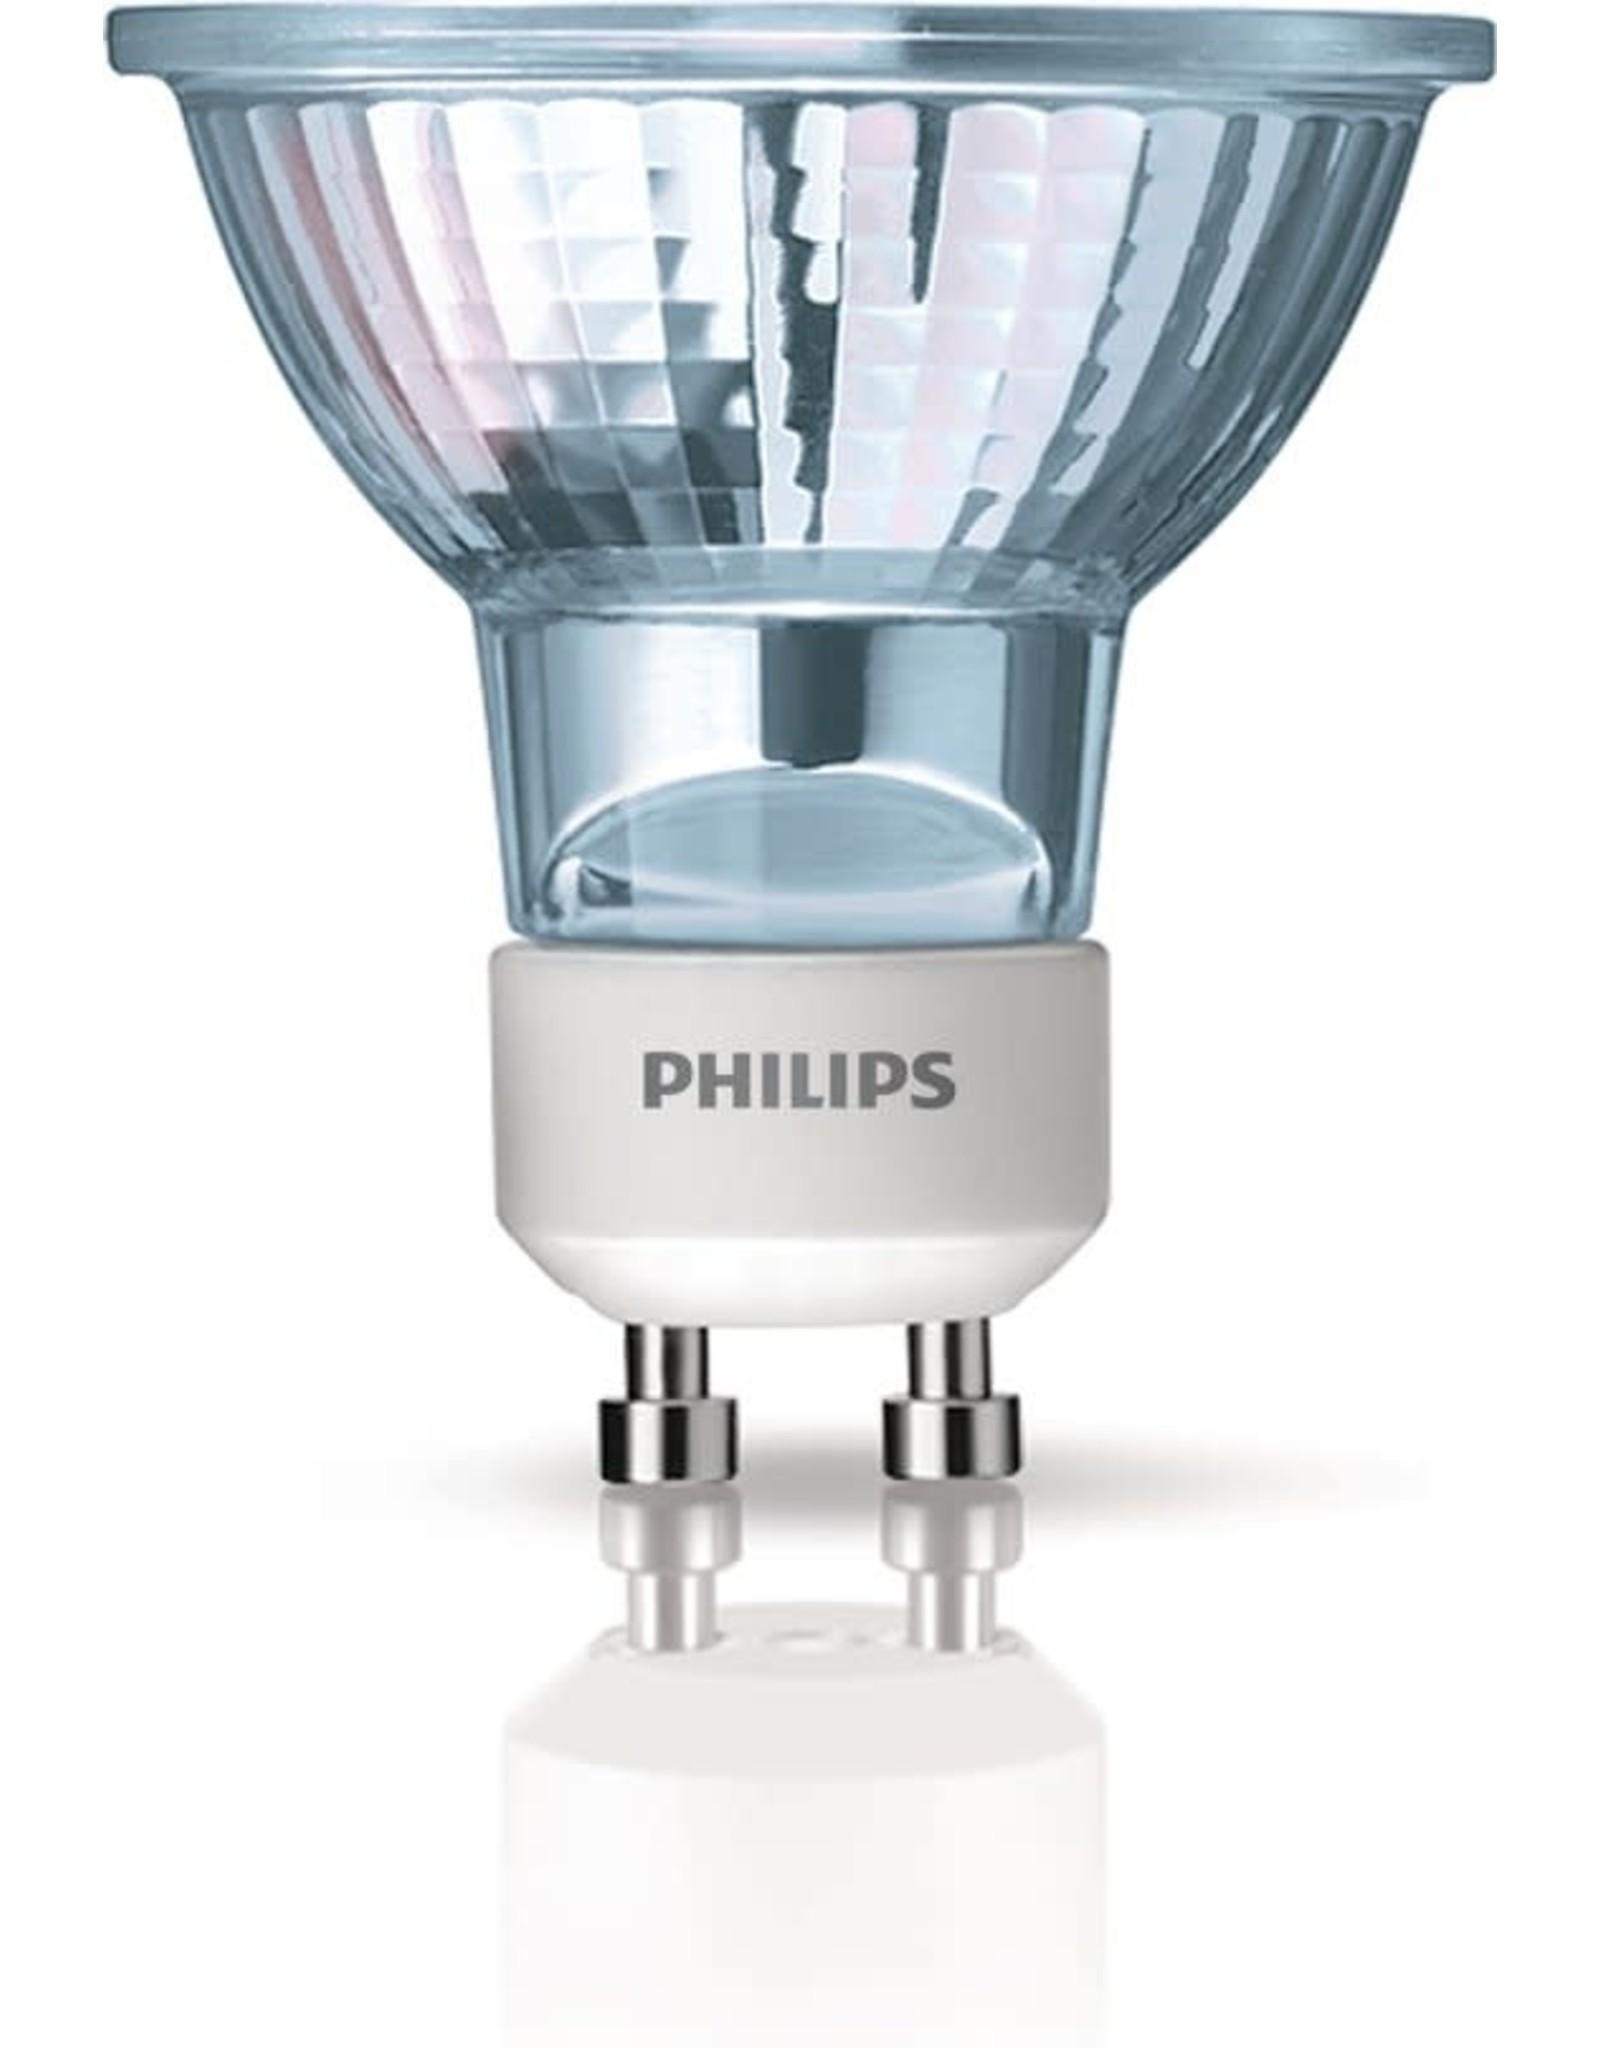 halogeenlamp GU10 35W 270Lm reflector